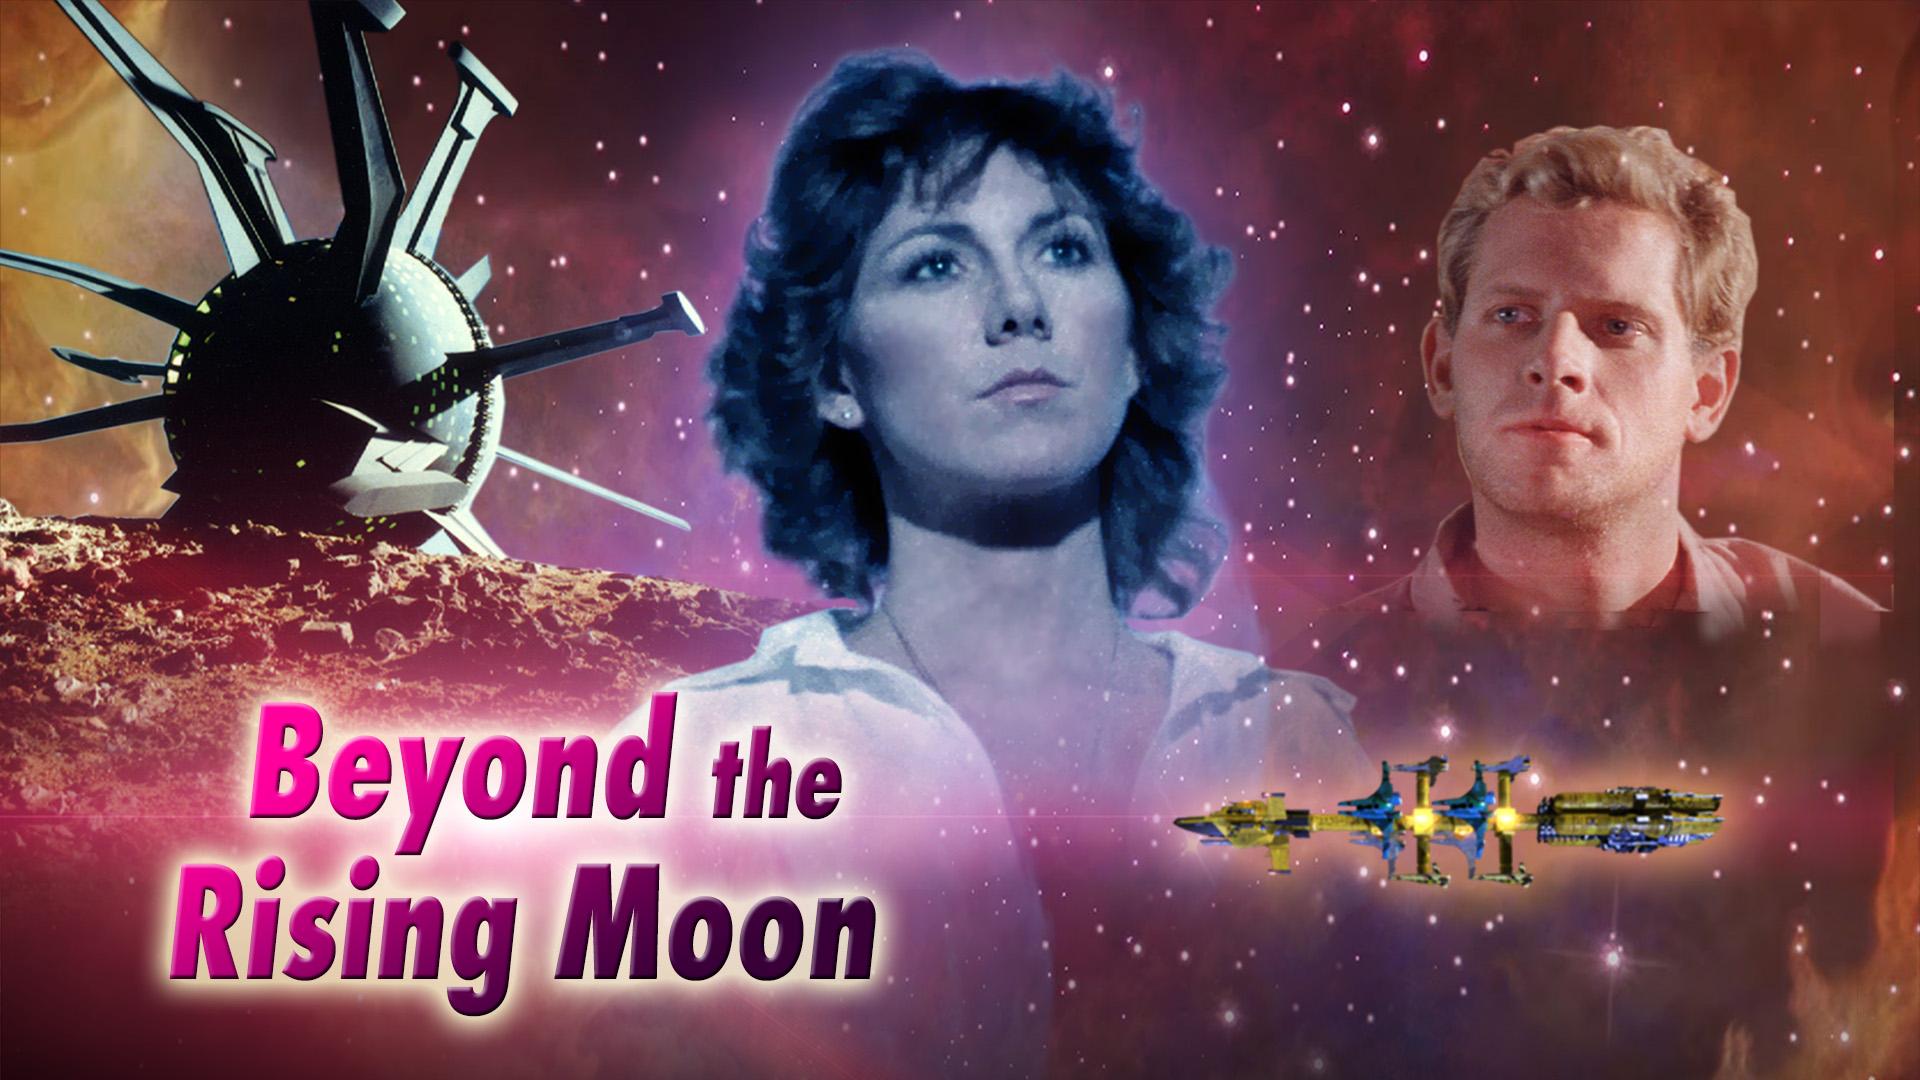 Beyond the Rising Moon